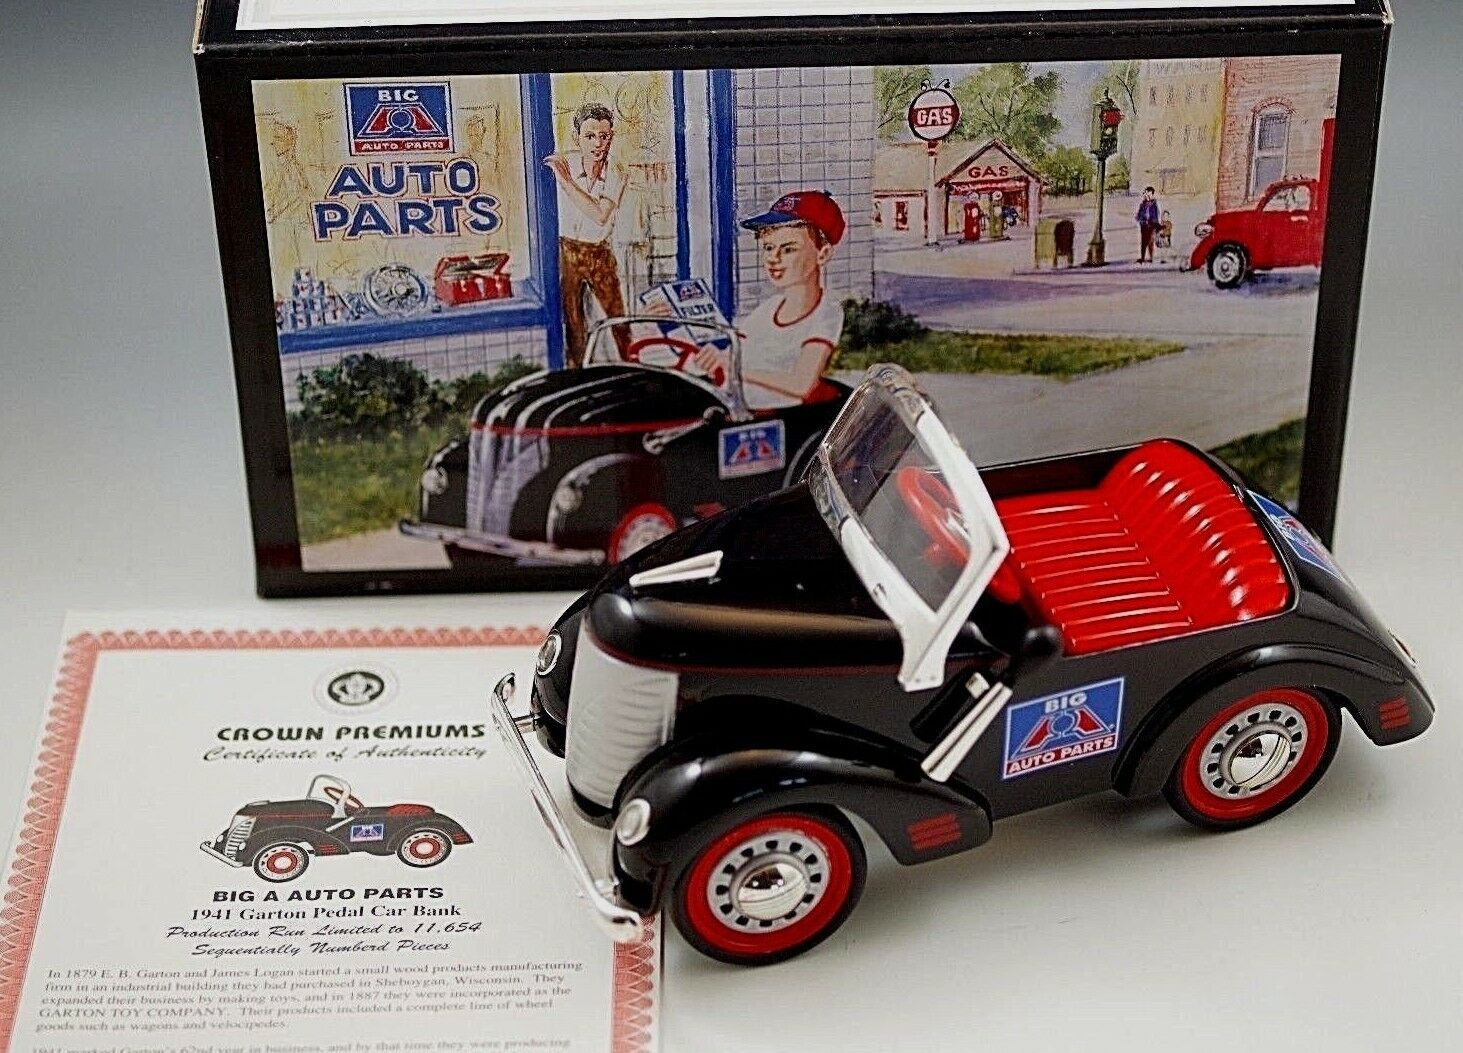 Big a Auto Parts Die Cast 1941 Garton Pedal Car Bank 1 6 Scale | eBay